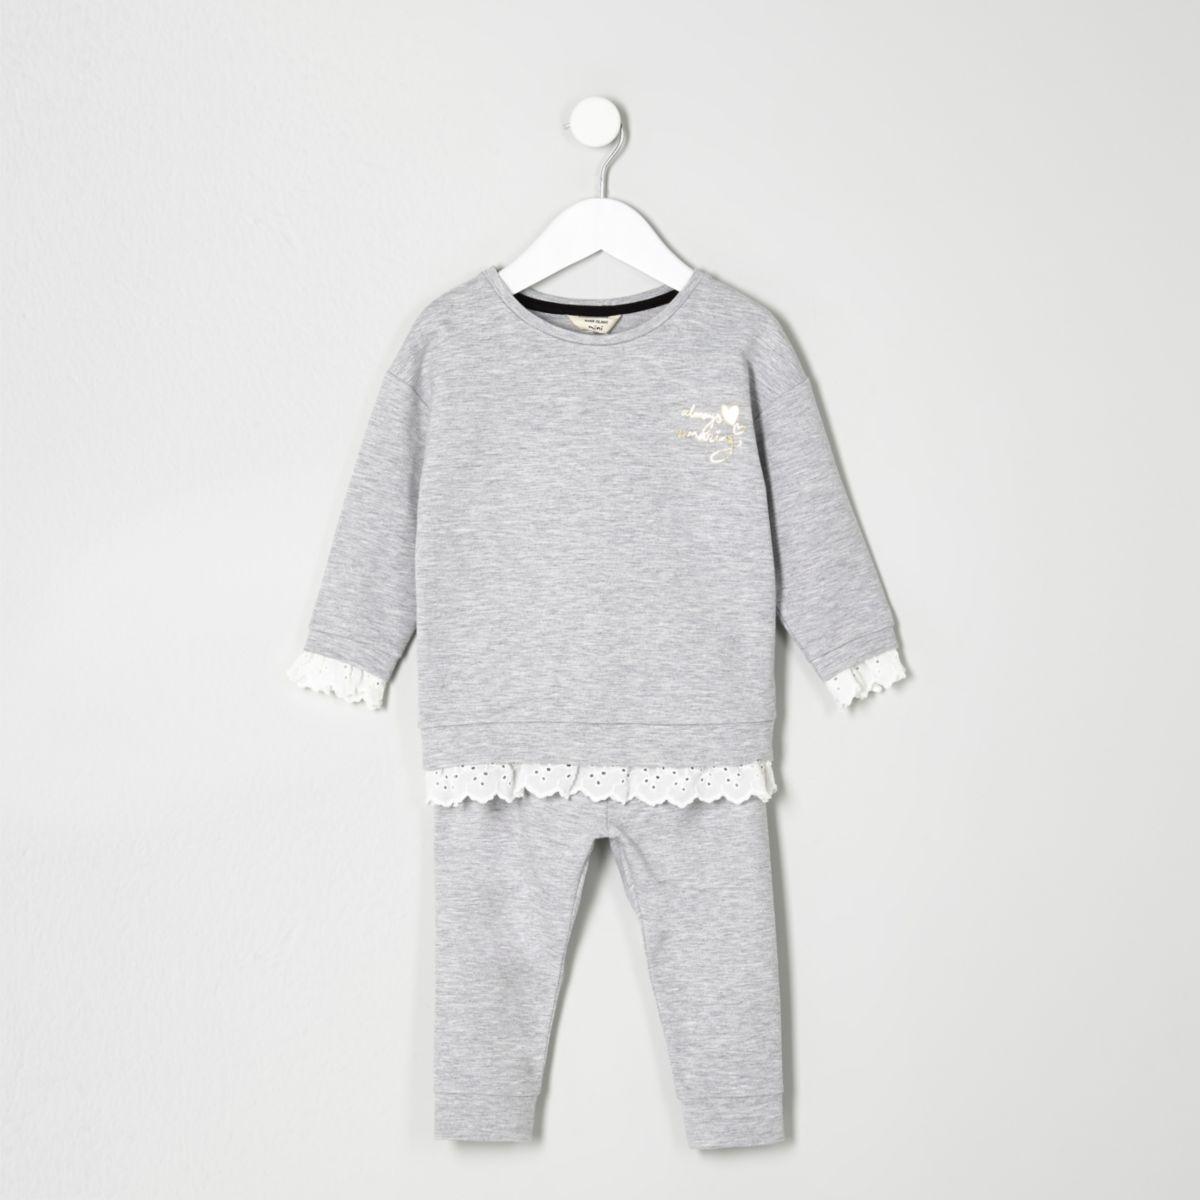 Mini girls grey lace hem sweatshirt outfit